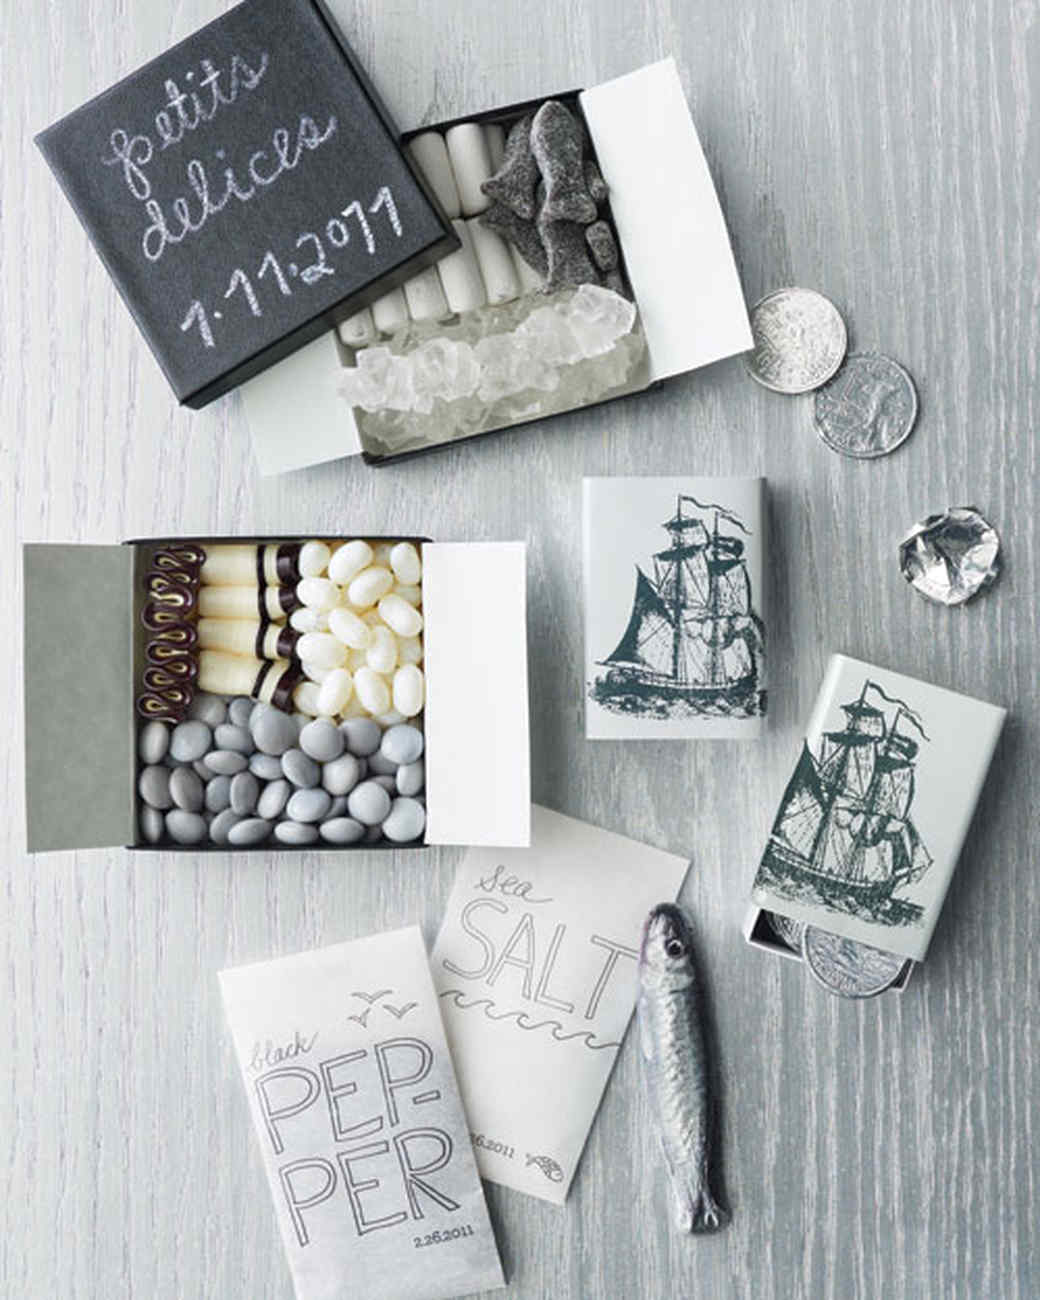 Packaging Clip Art and Templates | Martha Stewart